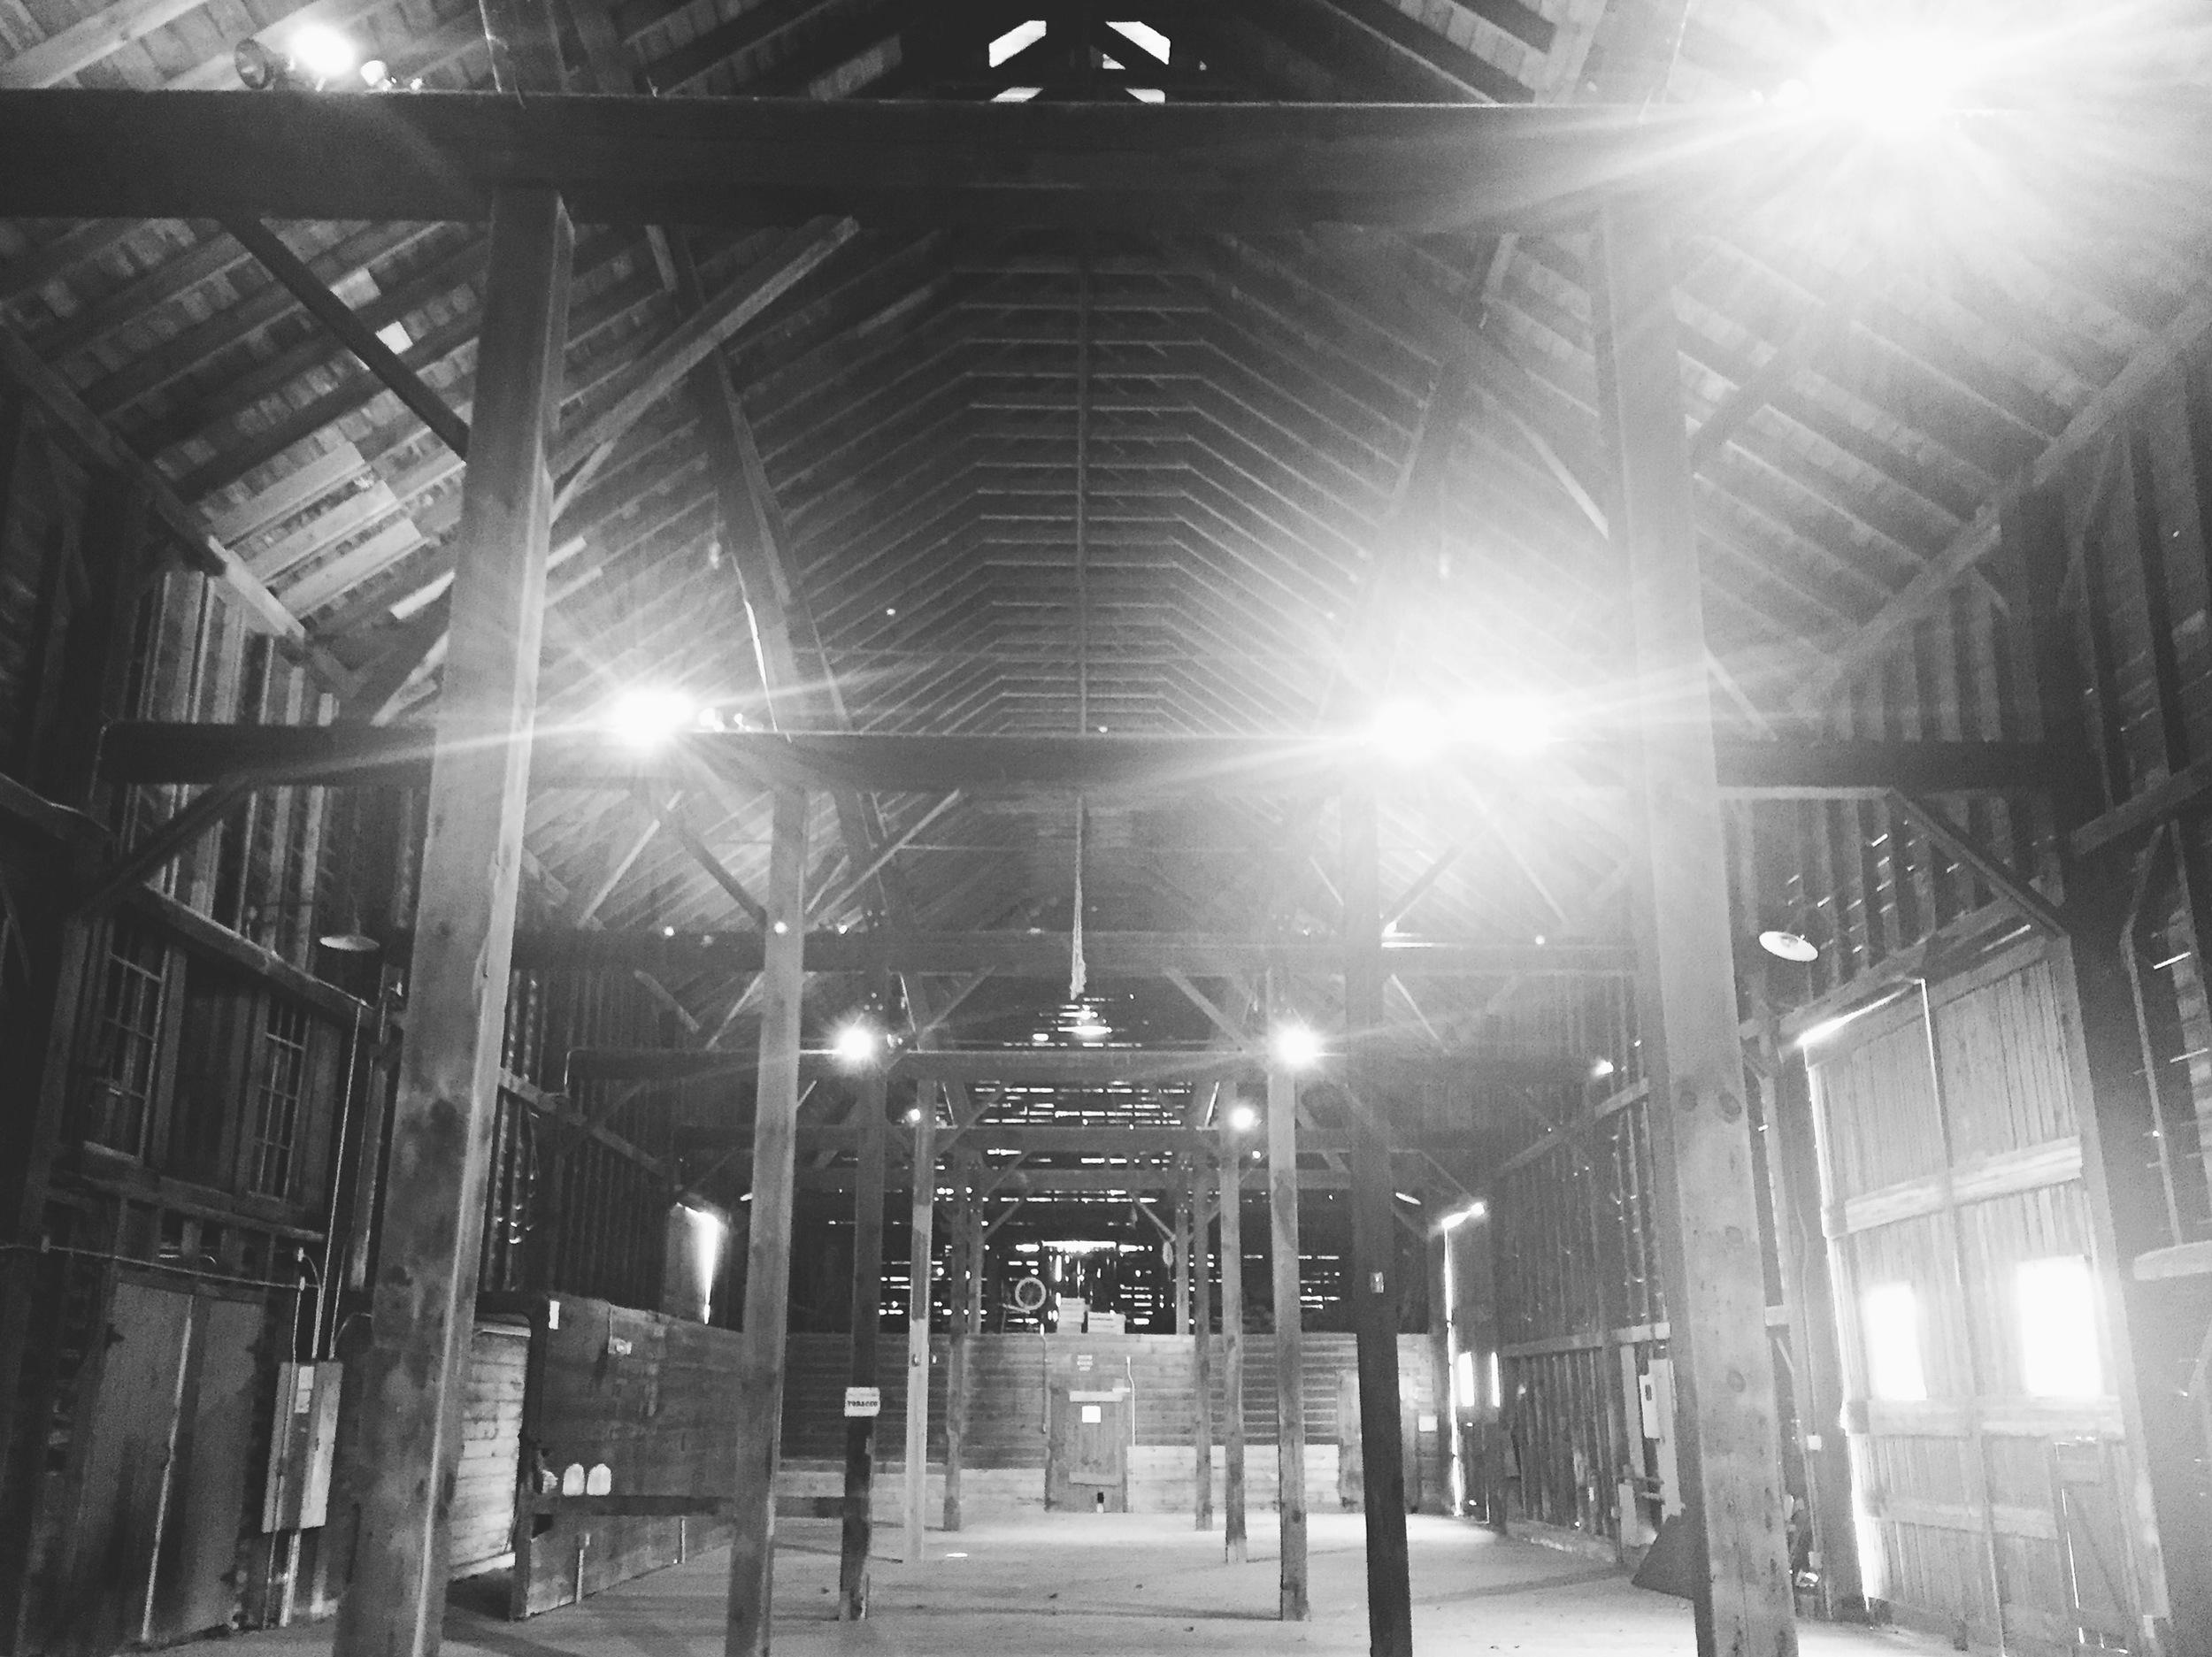 shaker heritage barn